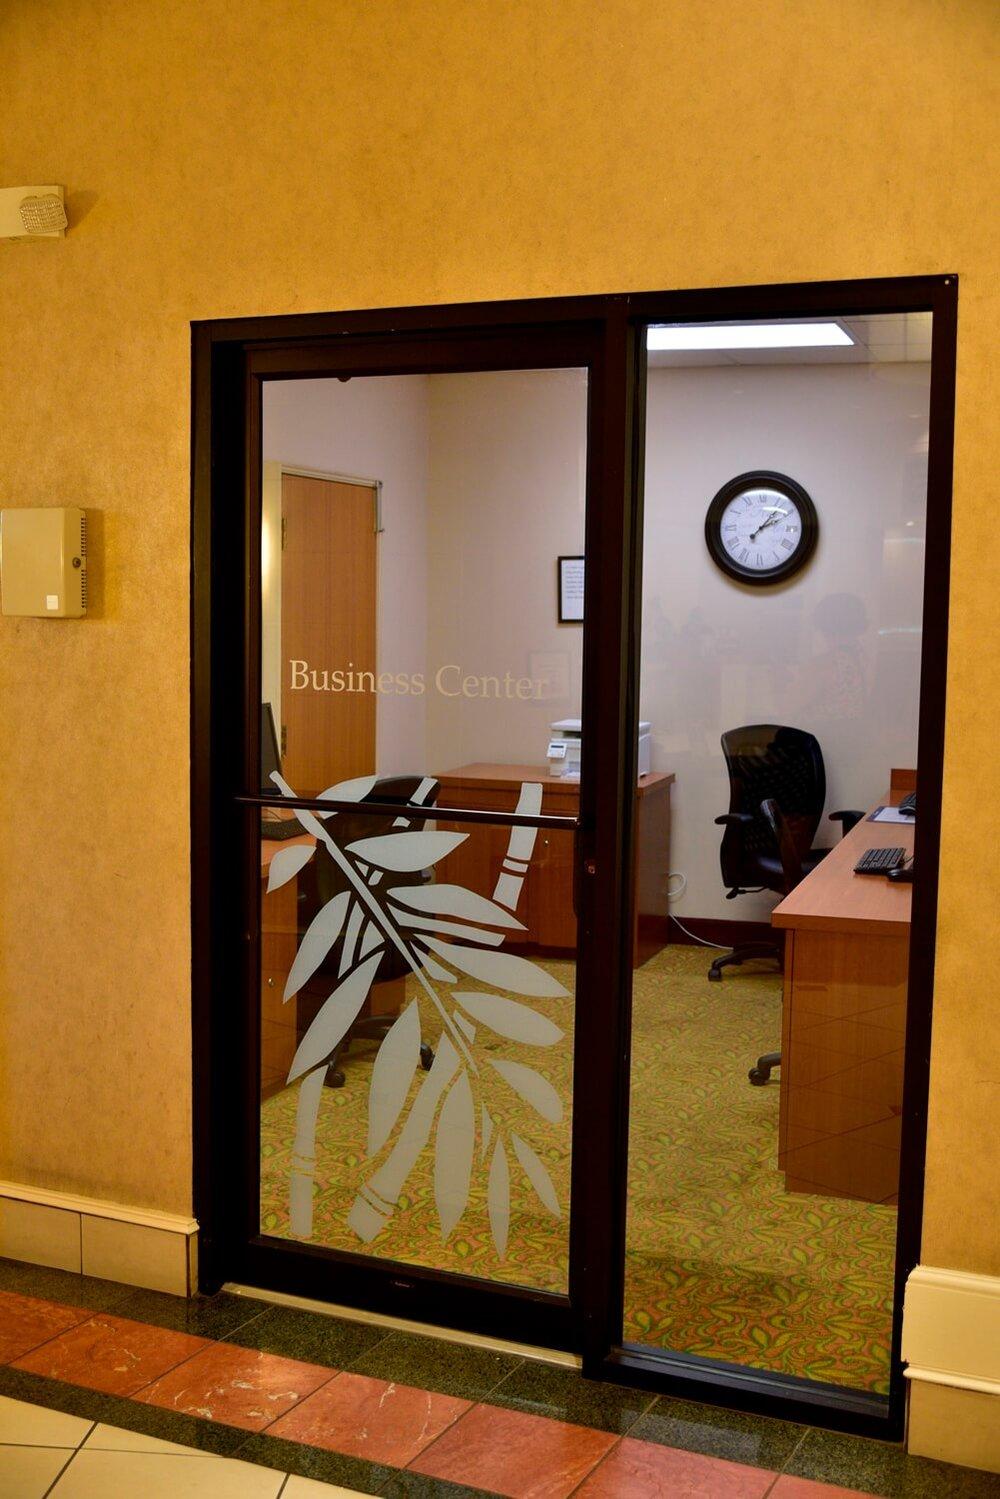 Business Center at Best Western Lake Buena Vista